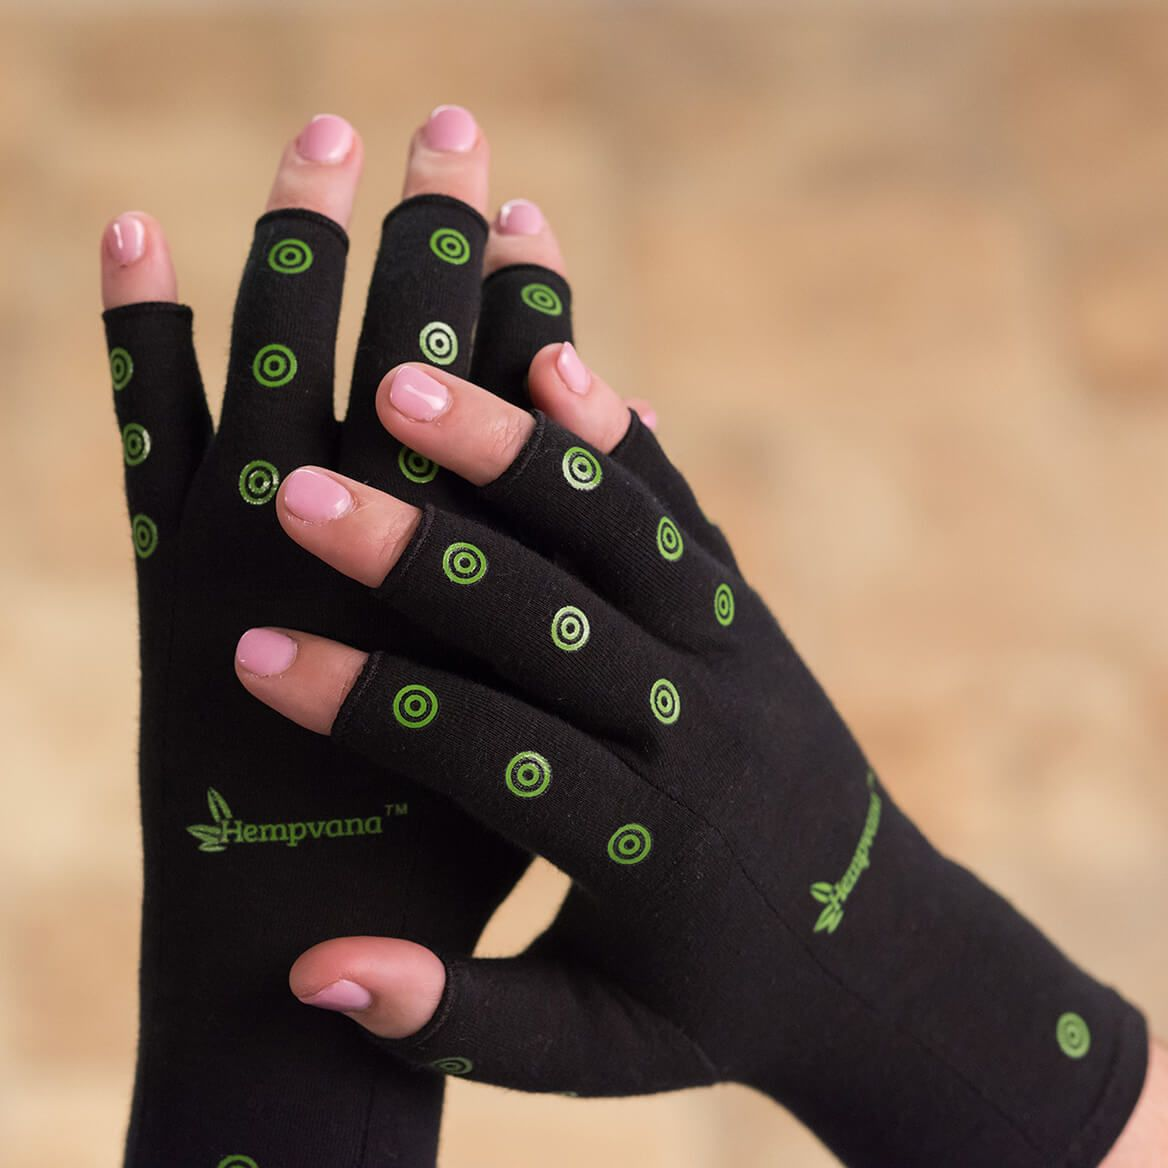 Hempvana Compression Gloves-368960